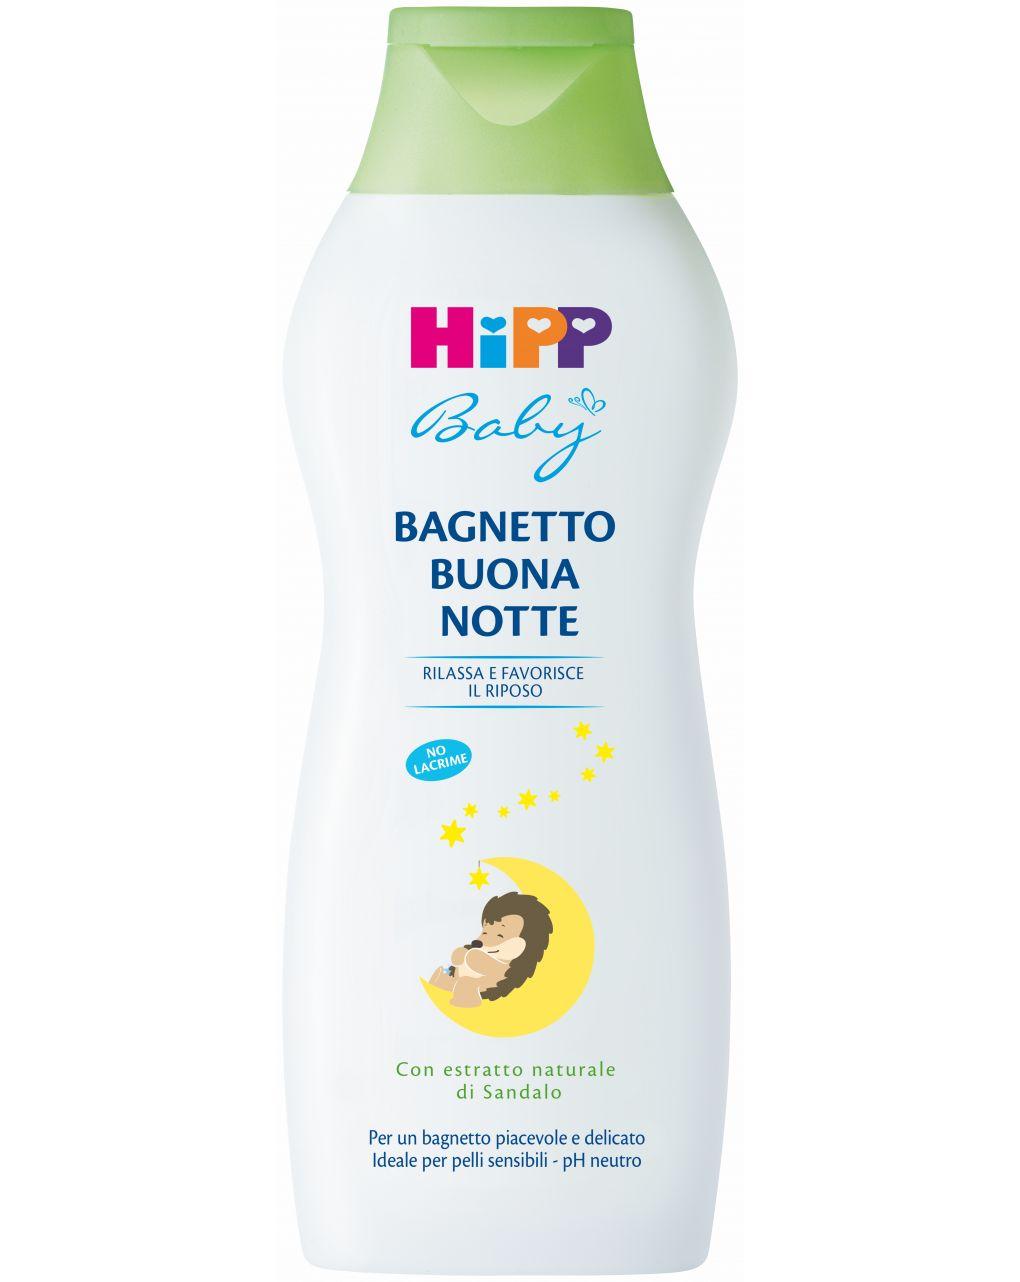 Bagnetto buona notte 350 ml - Hipp Baby